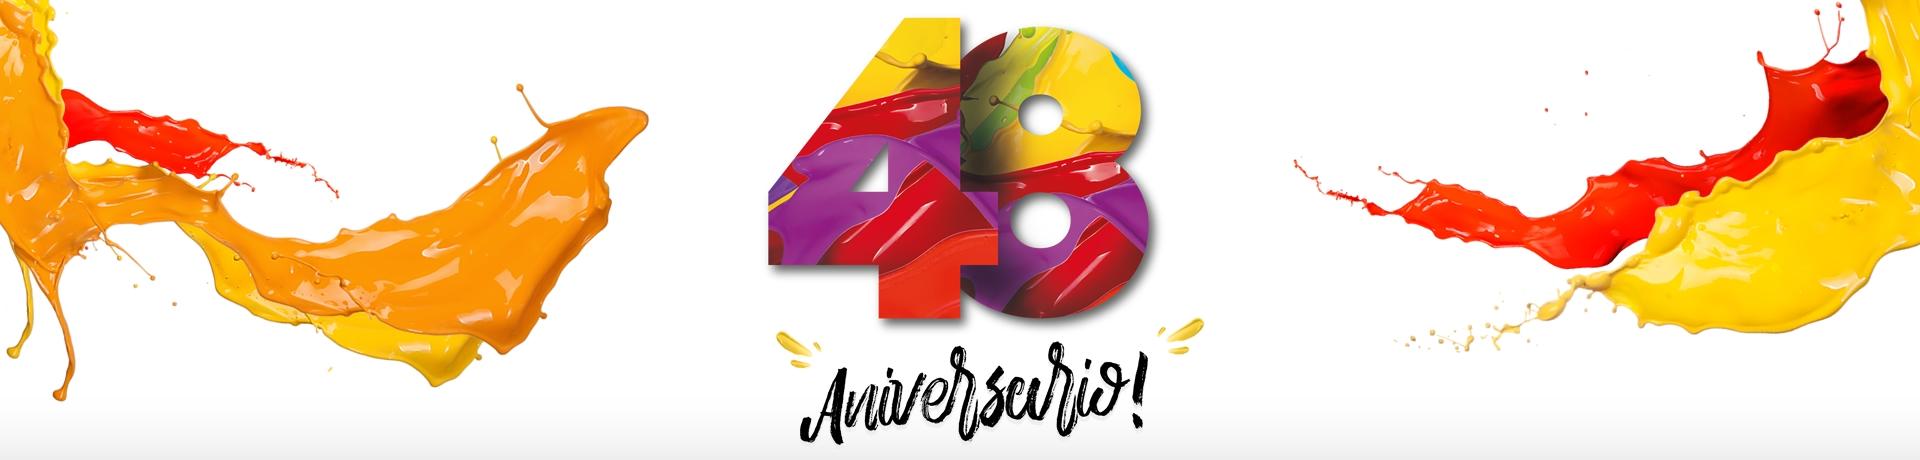 48 Aniversario